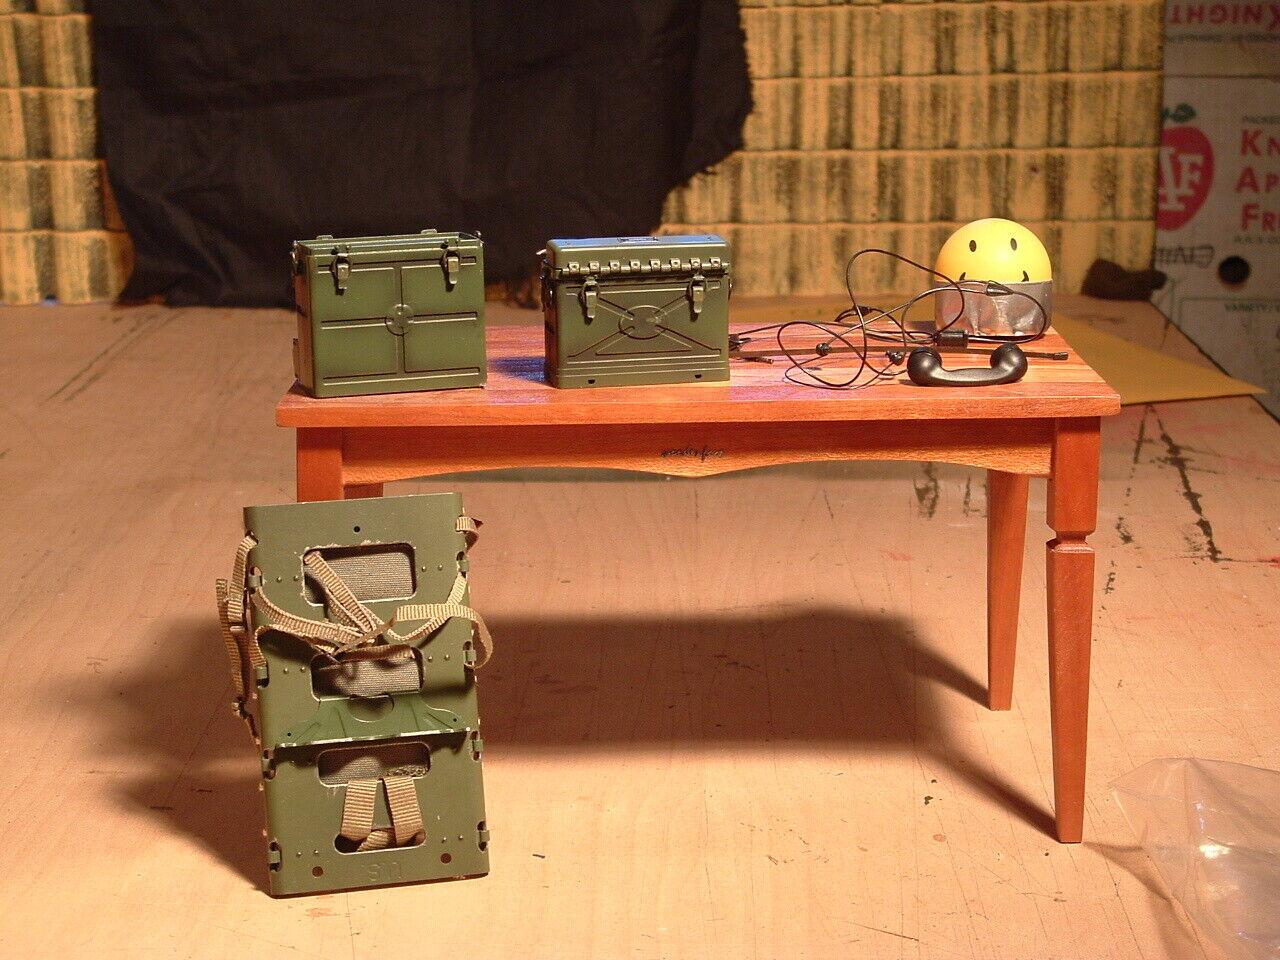 Escala 1 6 Dragón, BBI Segunda Guerra Mundial nos SCR-300 radio y accesorios  Sparky  Parsons